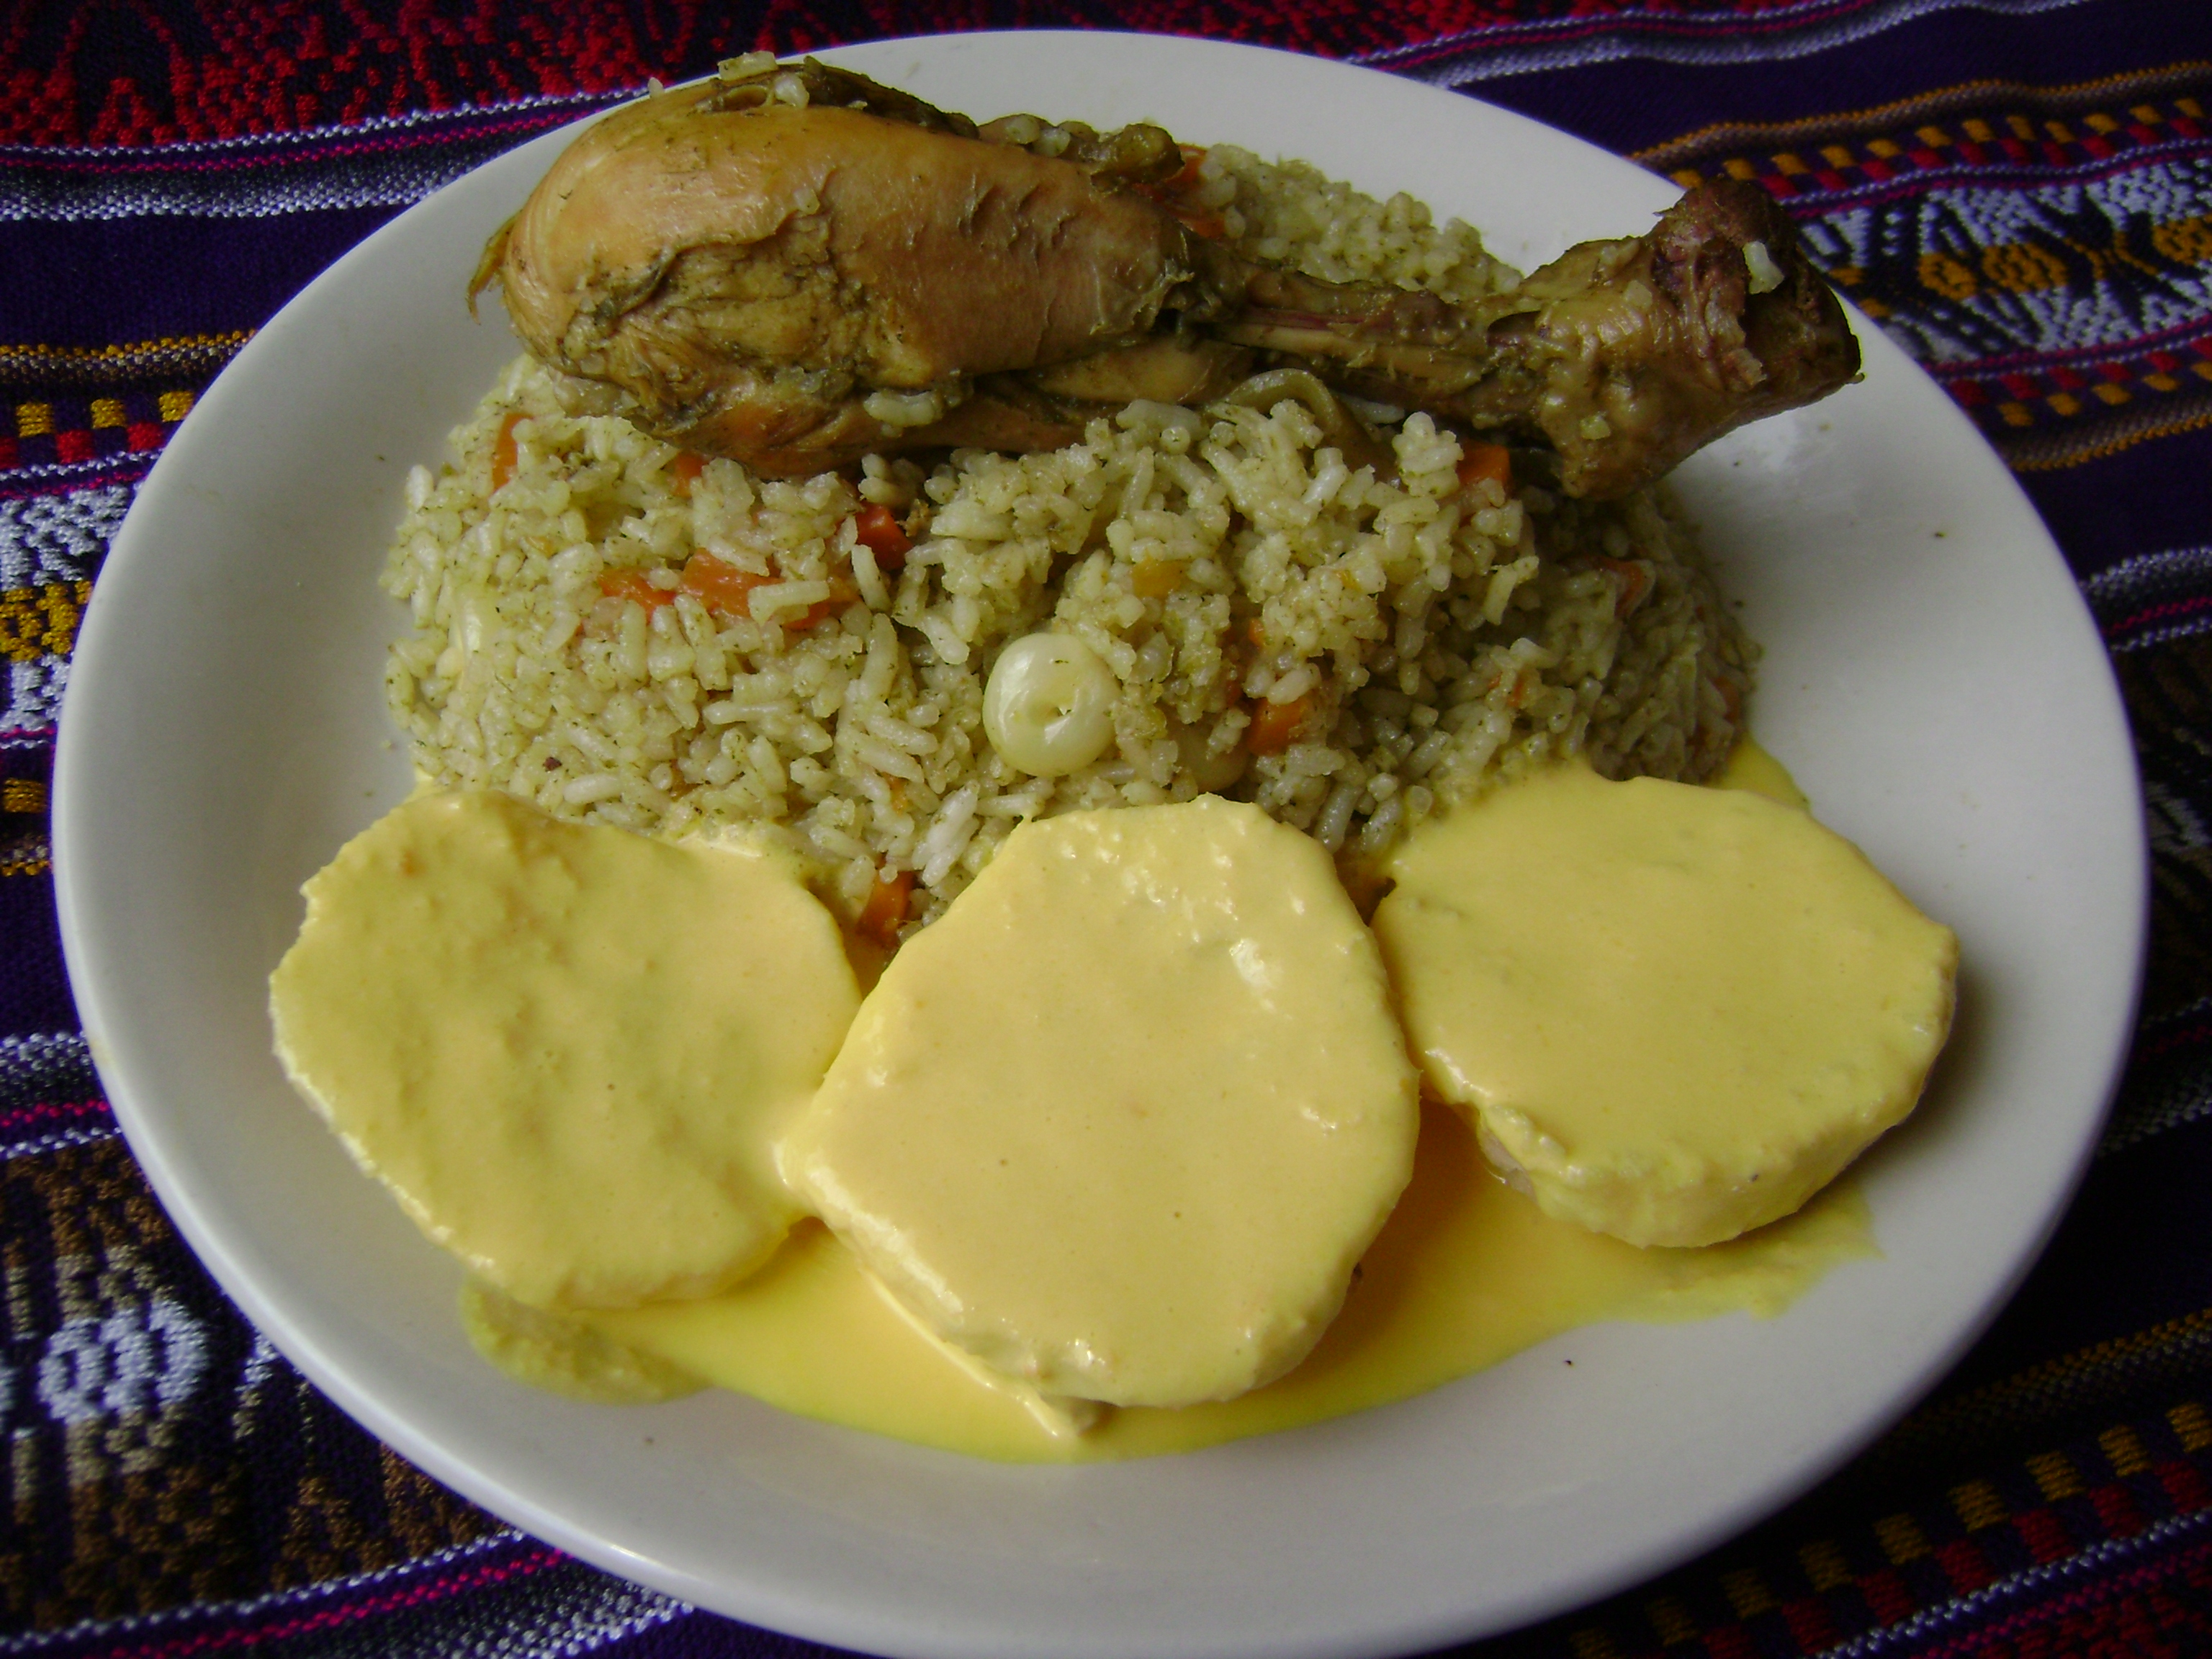 File:Arroz con pollo y papa a la huancaina.JPG - Wikipedia, the free ...